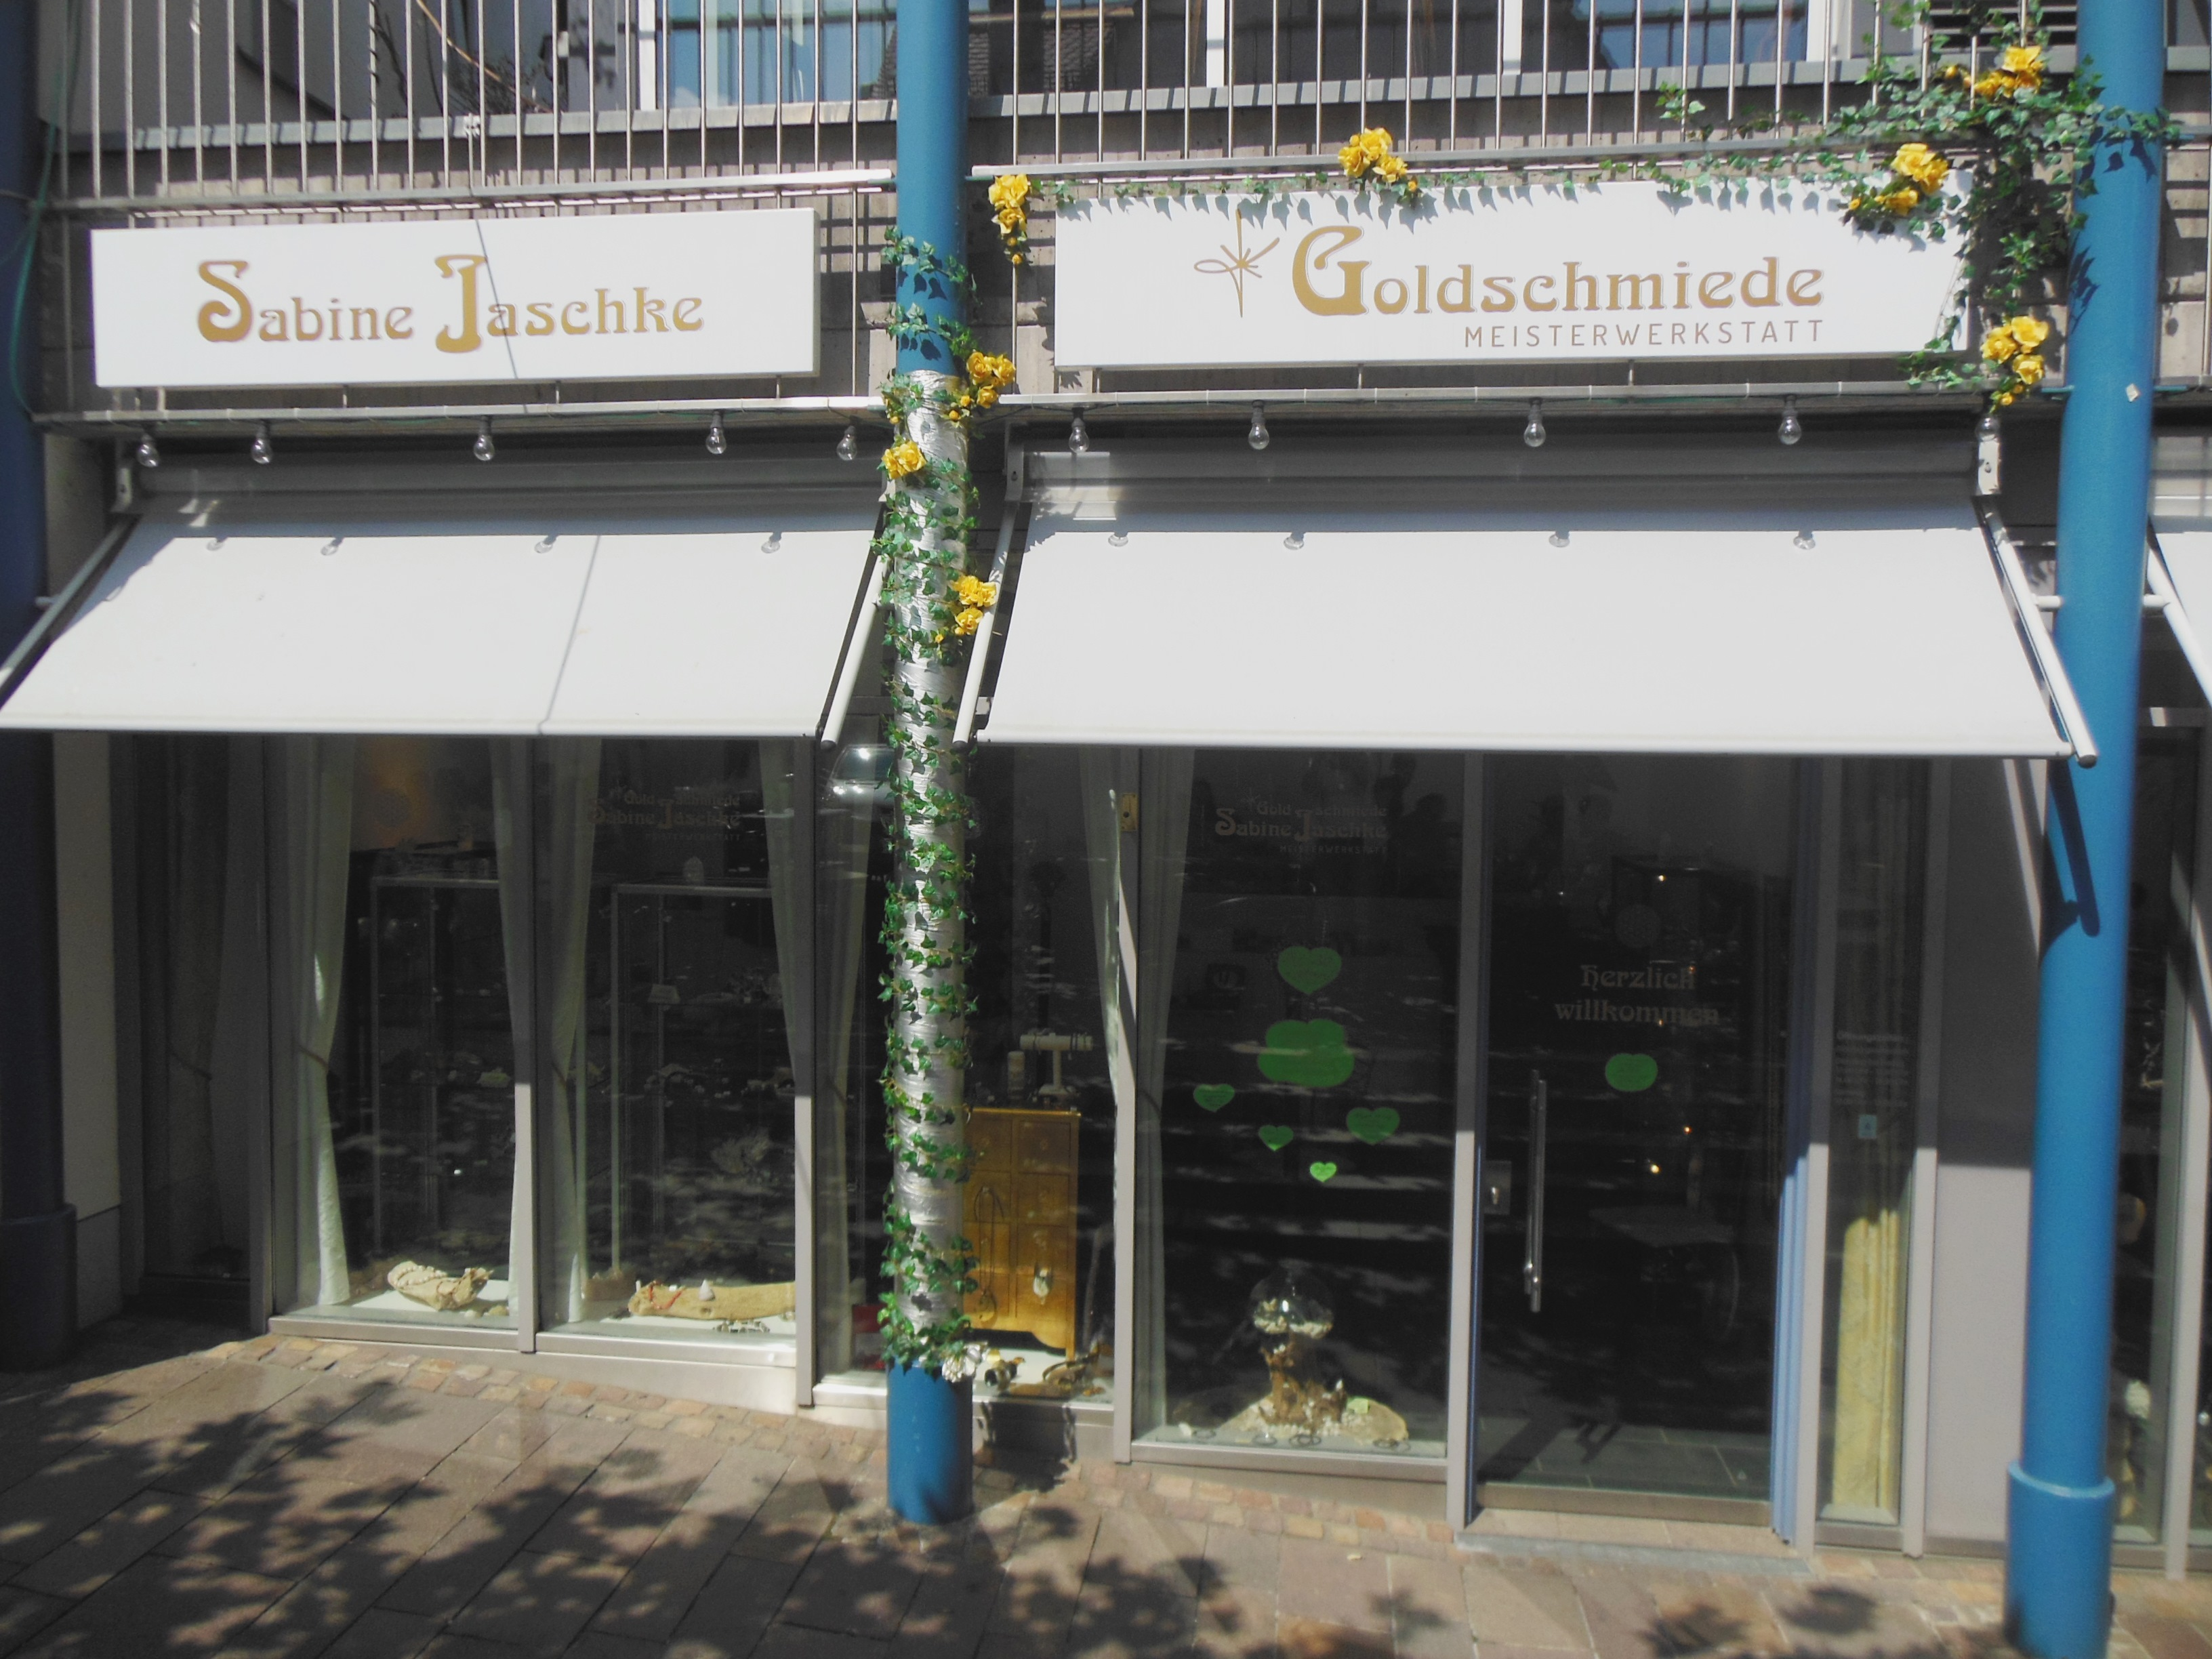 Gebäude_Goldschmiede_Jaschke